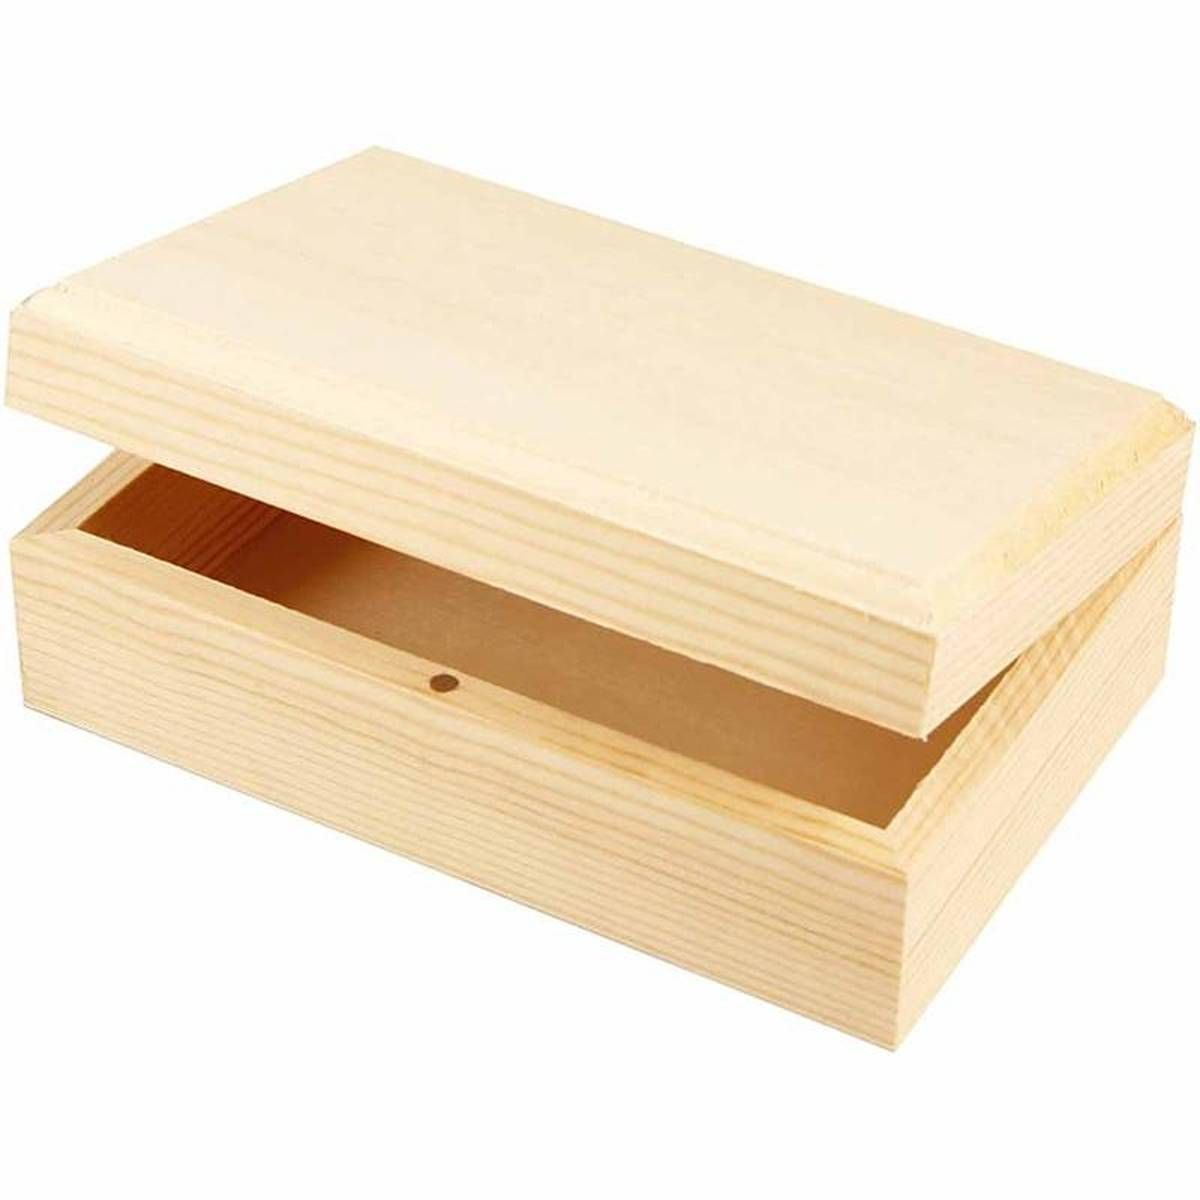 Wooden Pine Jewellery Box 14 X 5 X 9 Cm Hobbycraft Diy Ideas